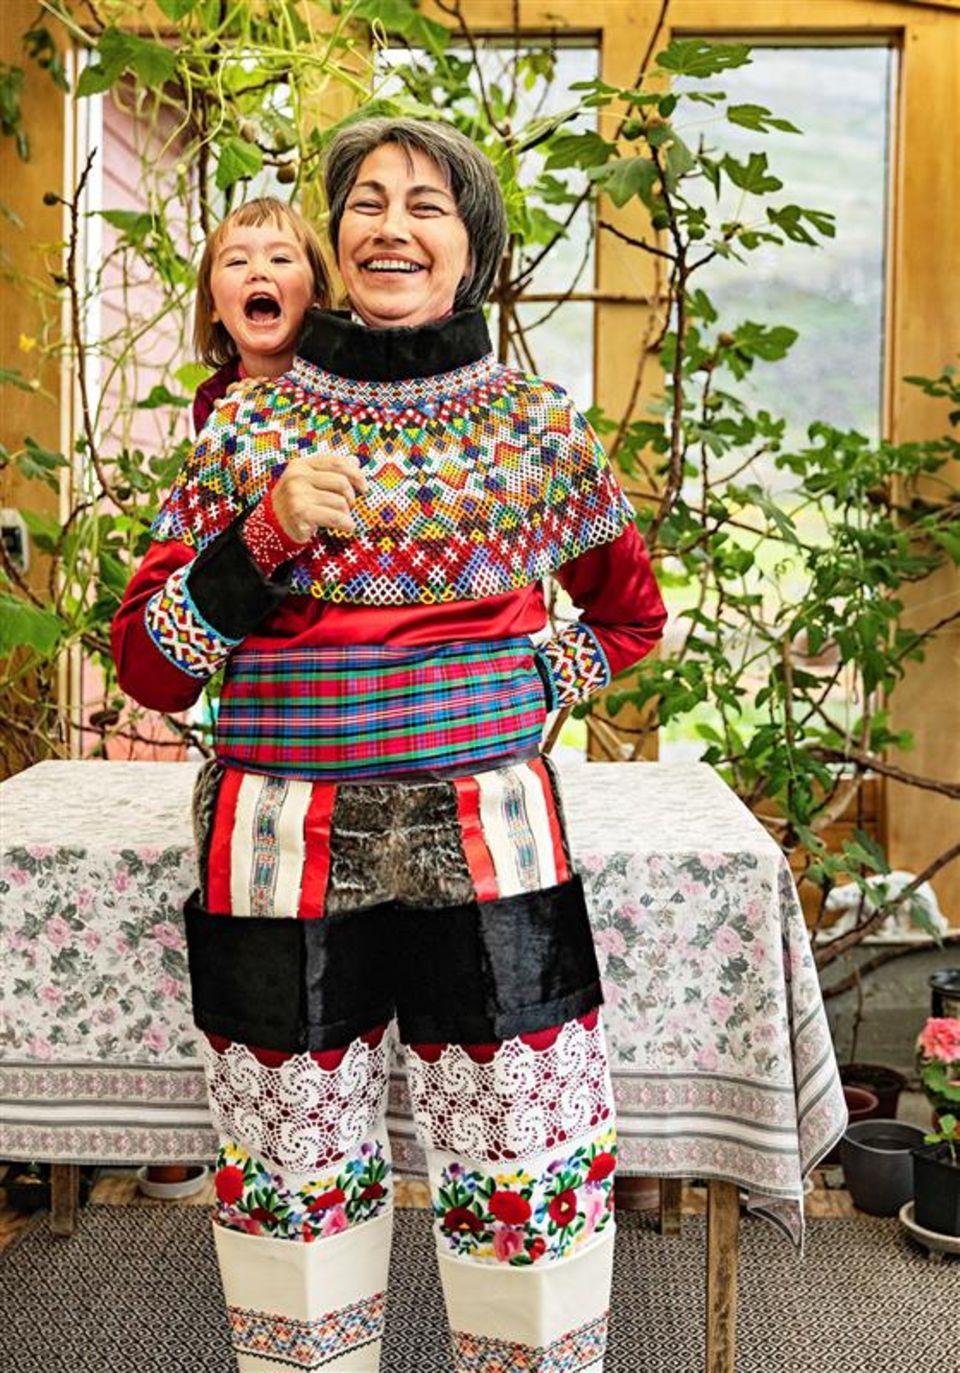 Grönland: Frau mit Kind lacht